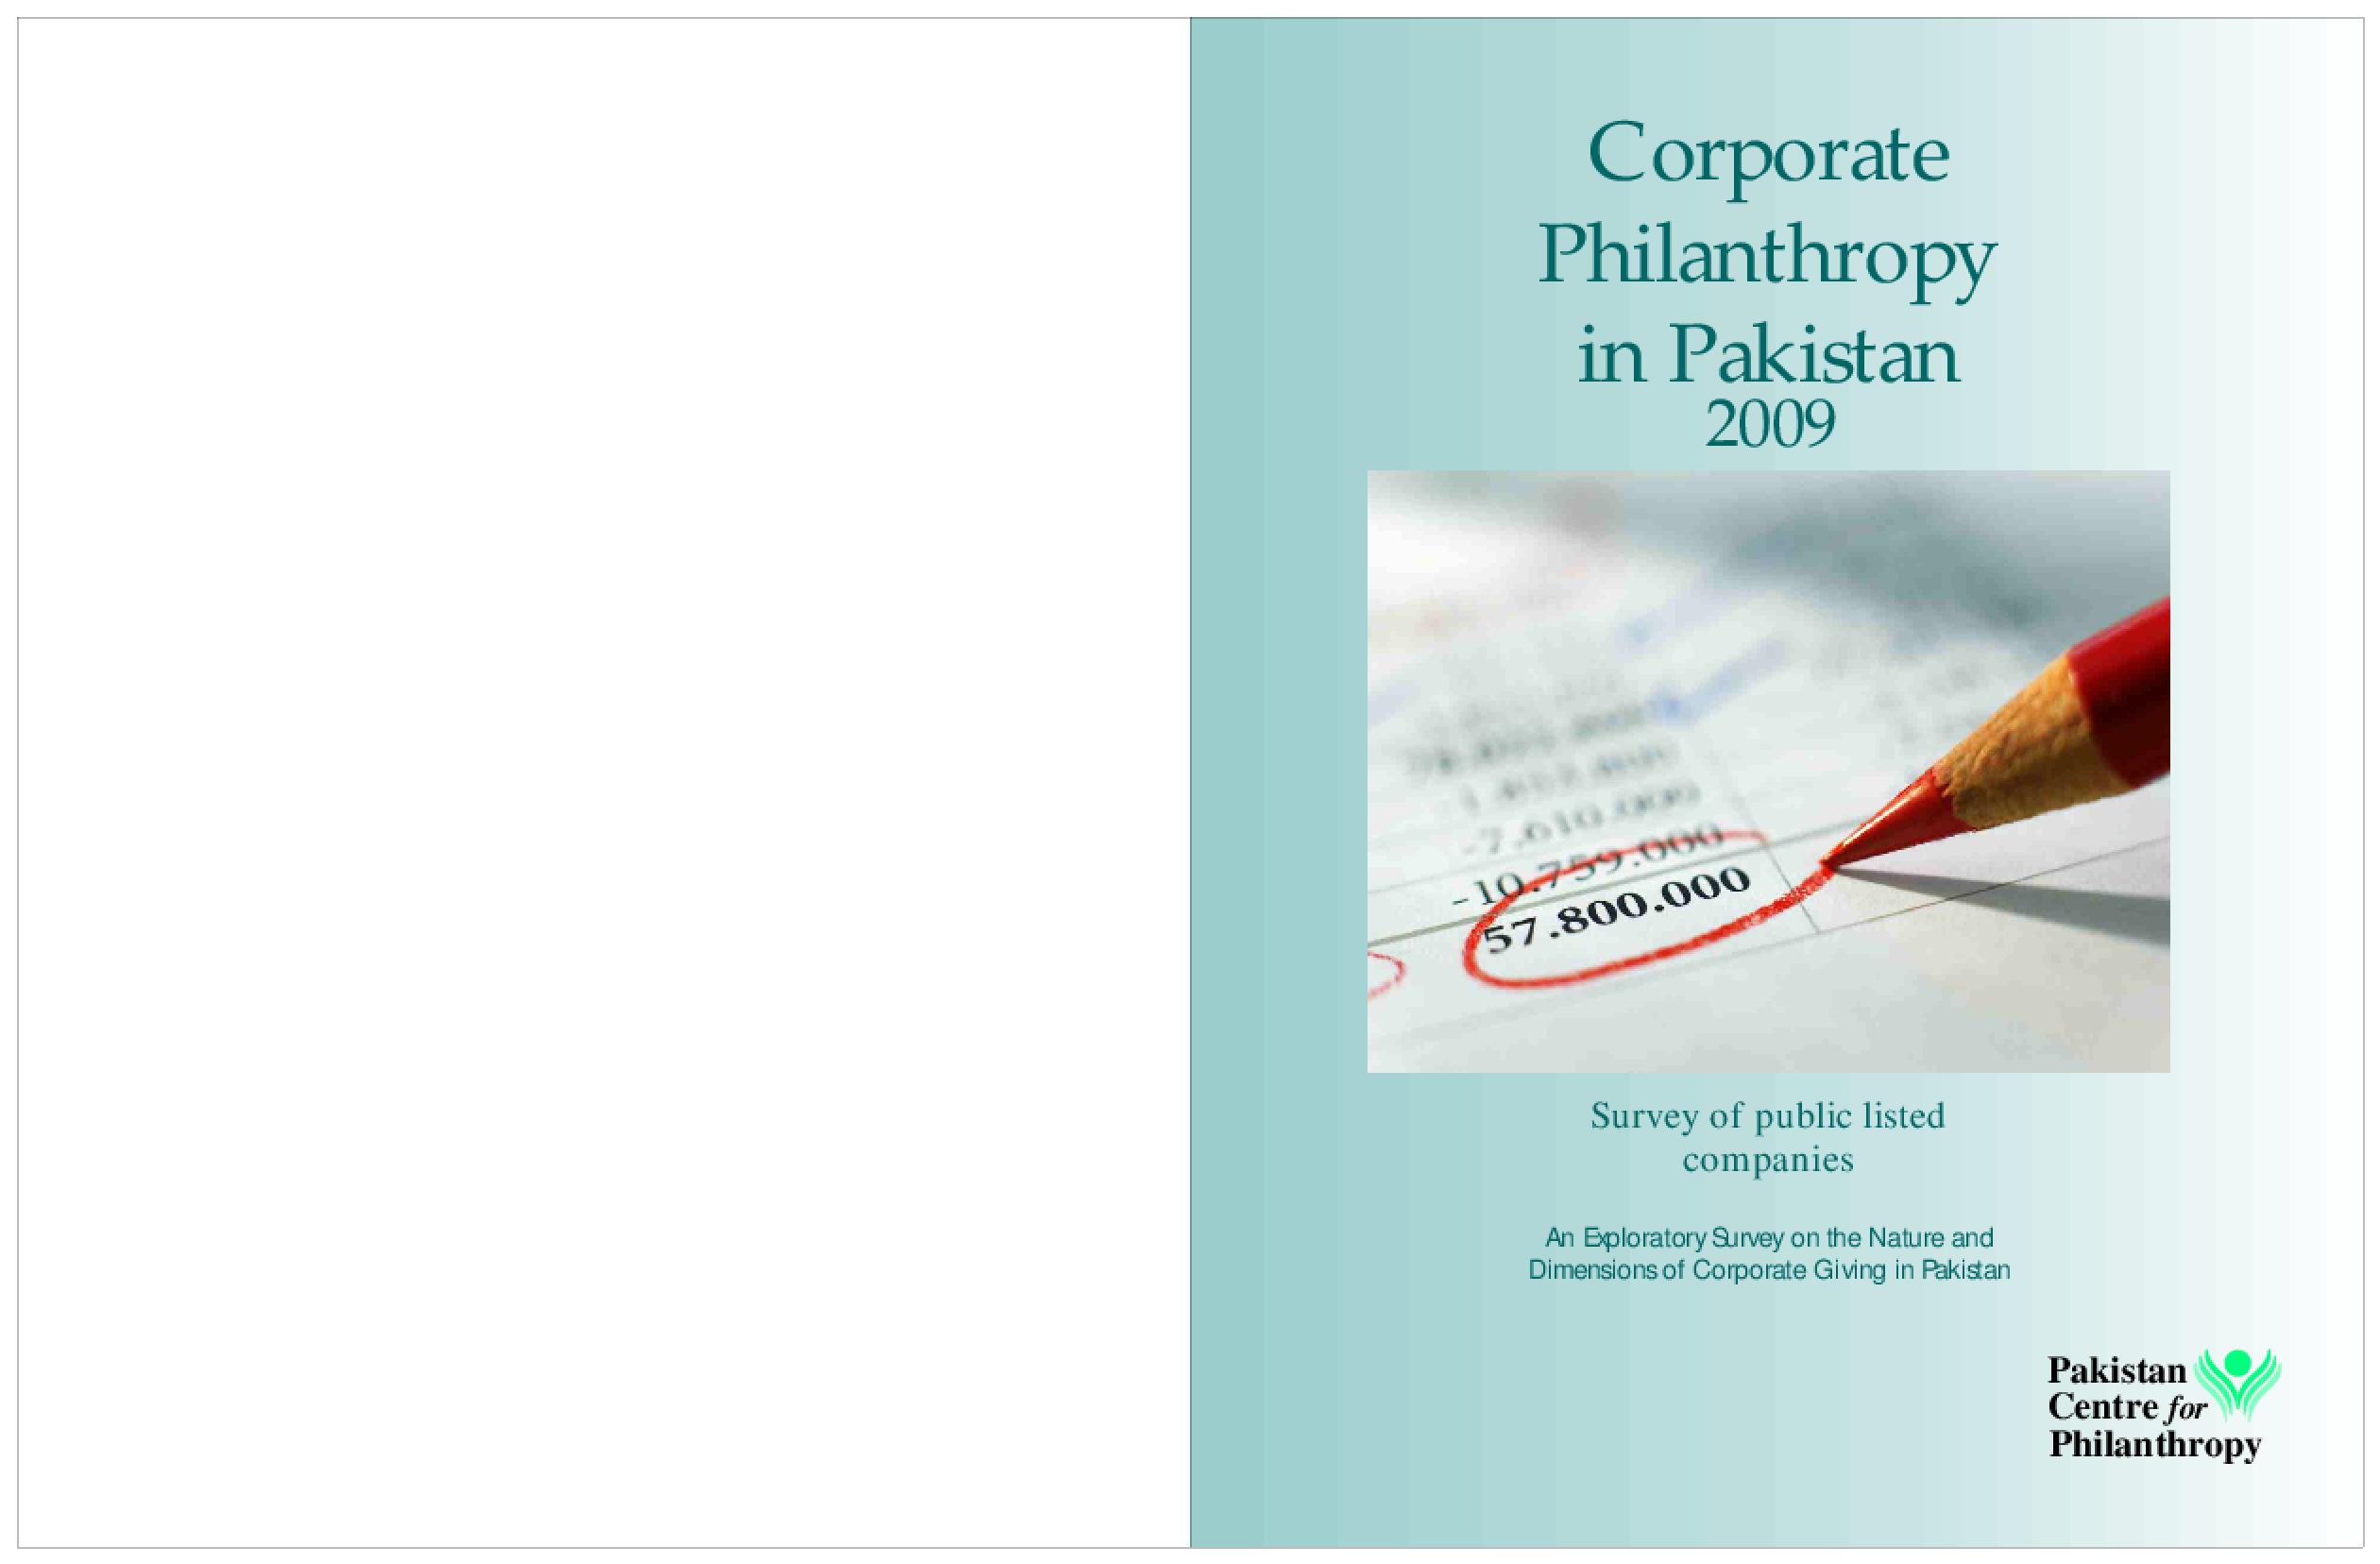 Corporate Philanthropy in Pakistan 2009